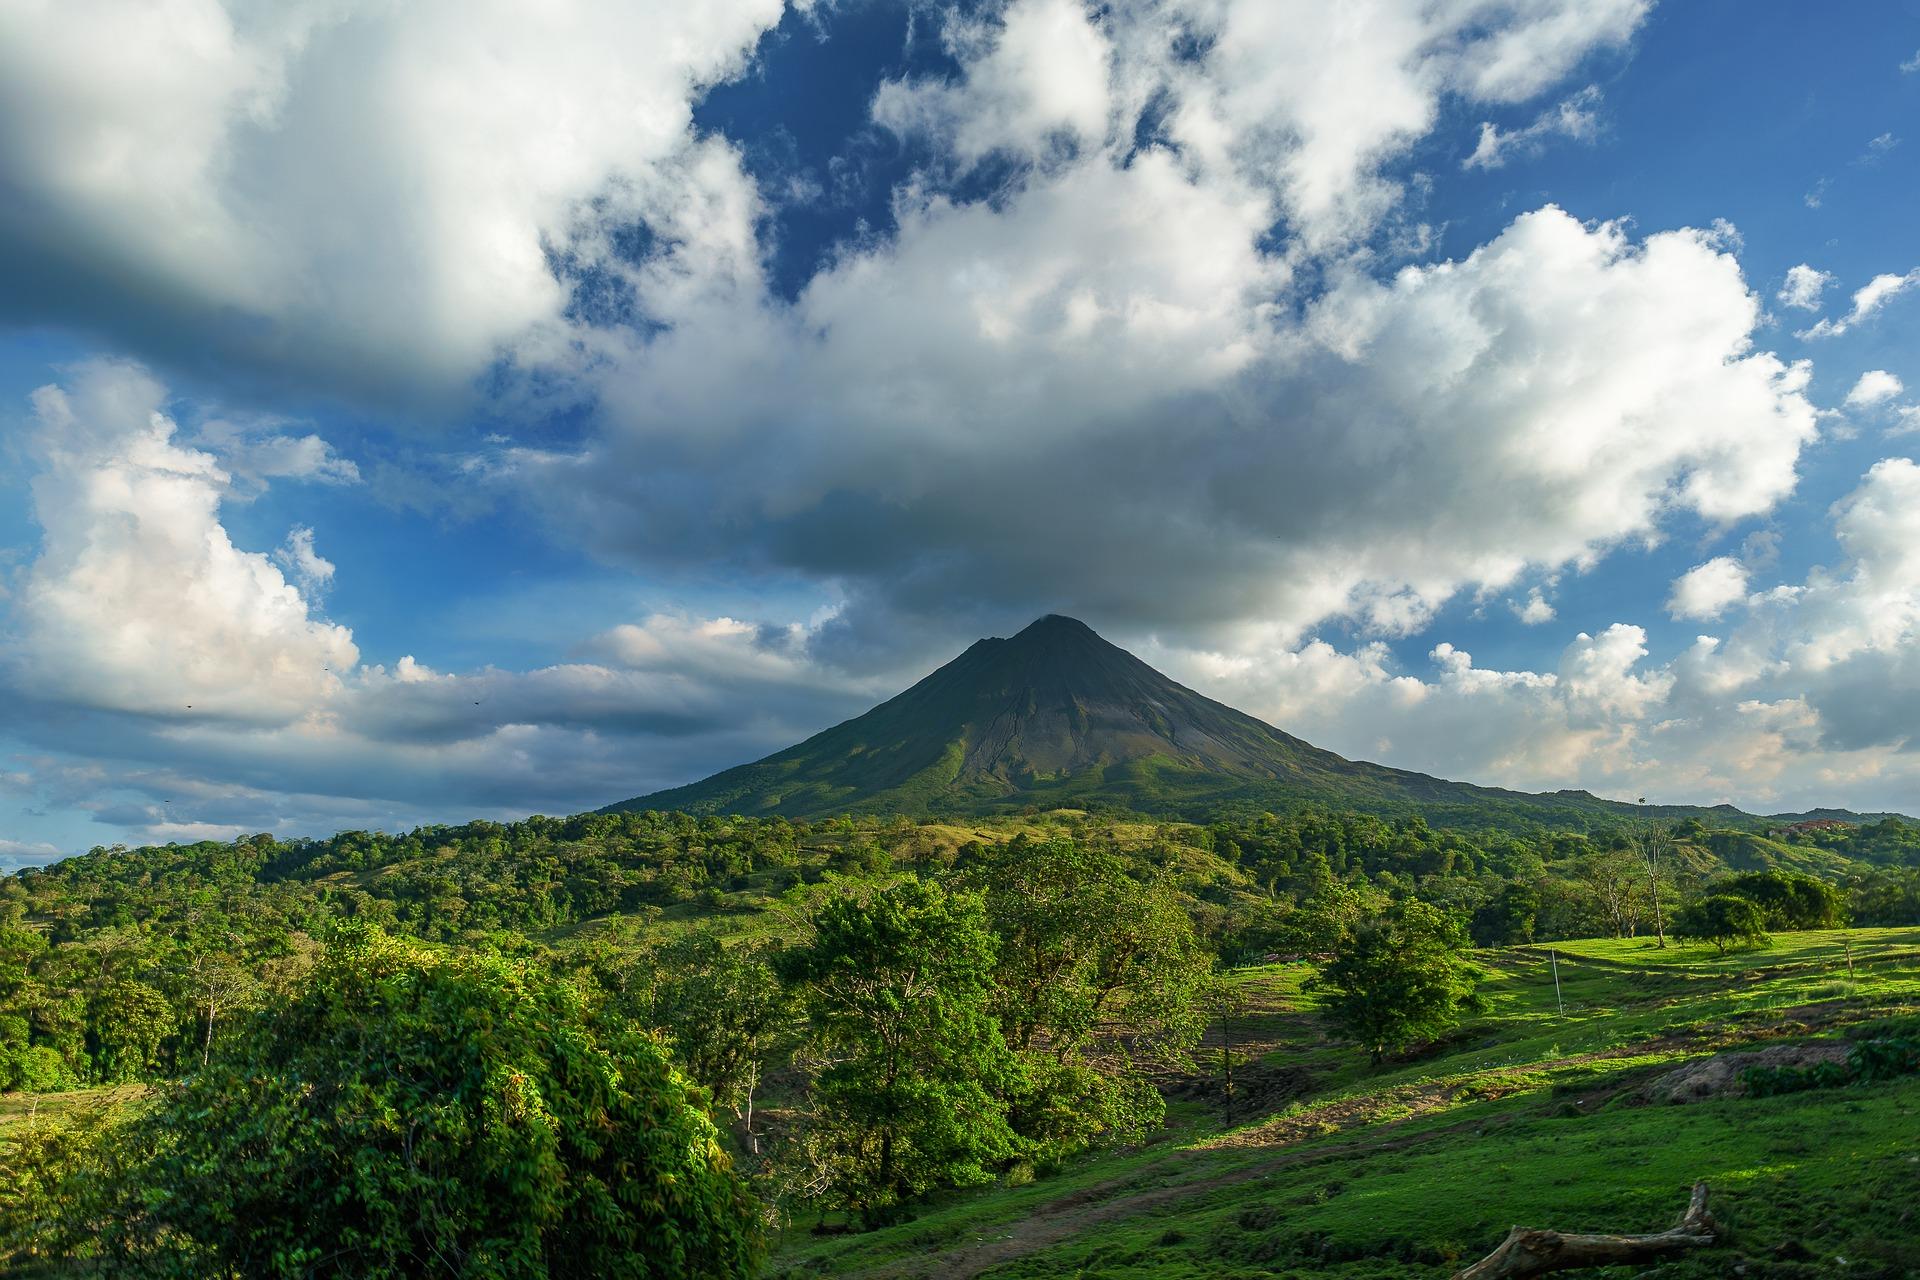 gründe inaktiven vulkan